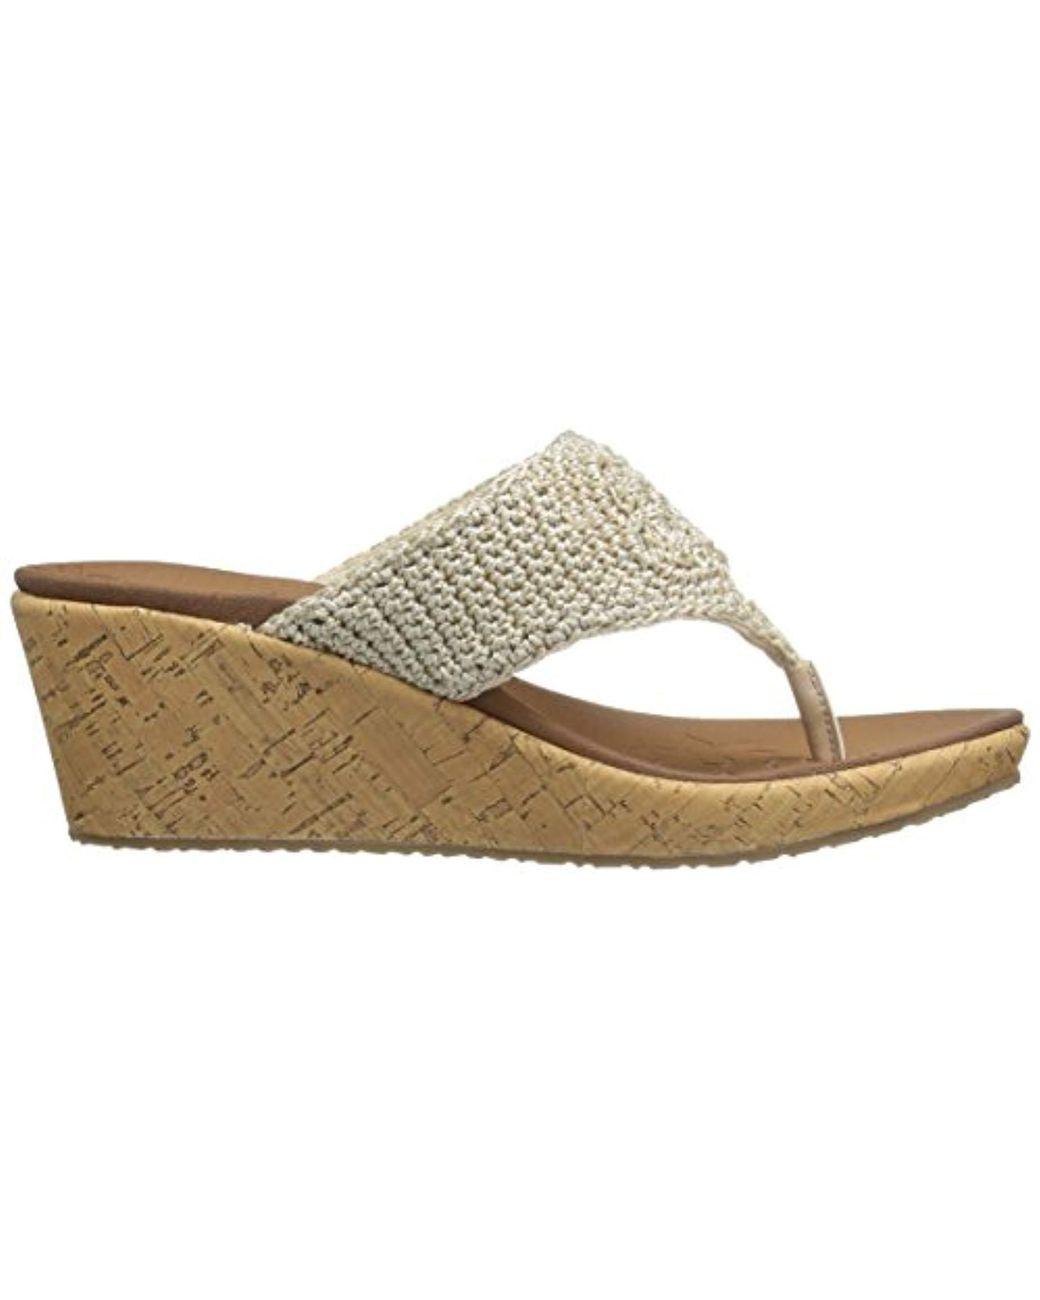 d1f3402b8283 Lyst - Skechers Cali Beverlee Wedge Sandal in Natural - Save 11%